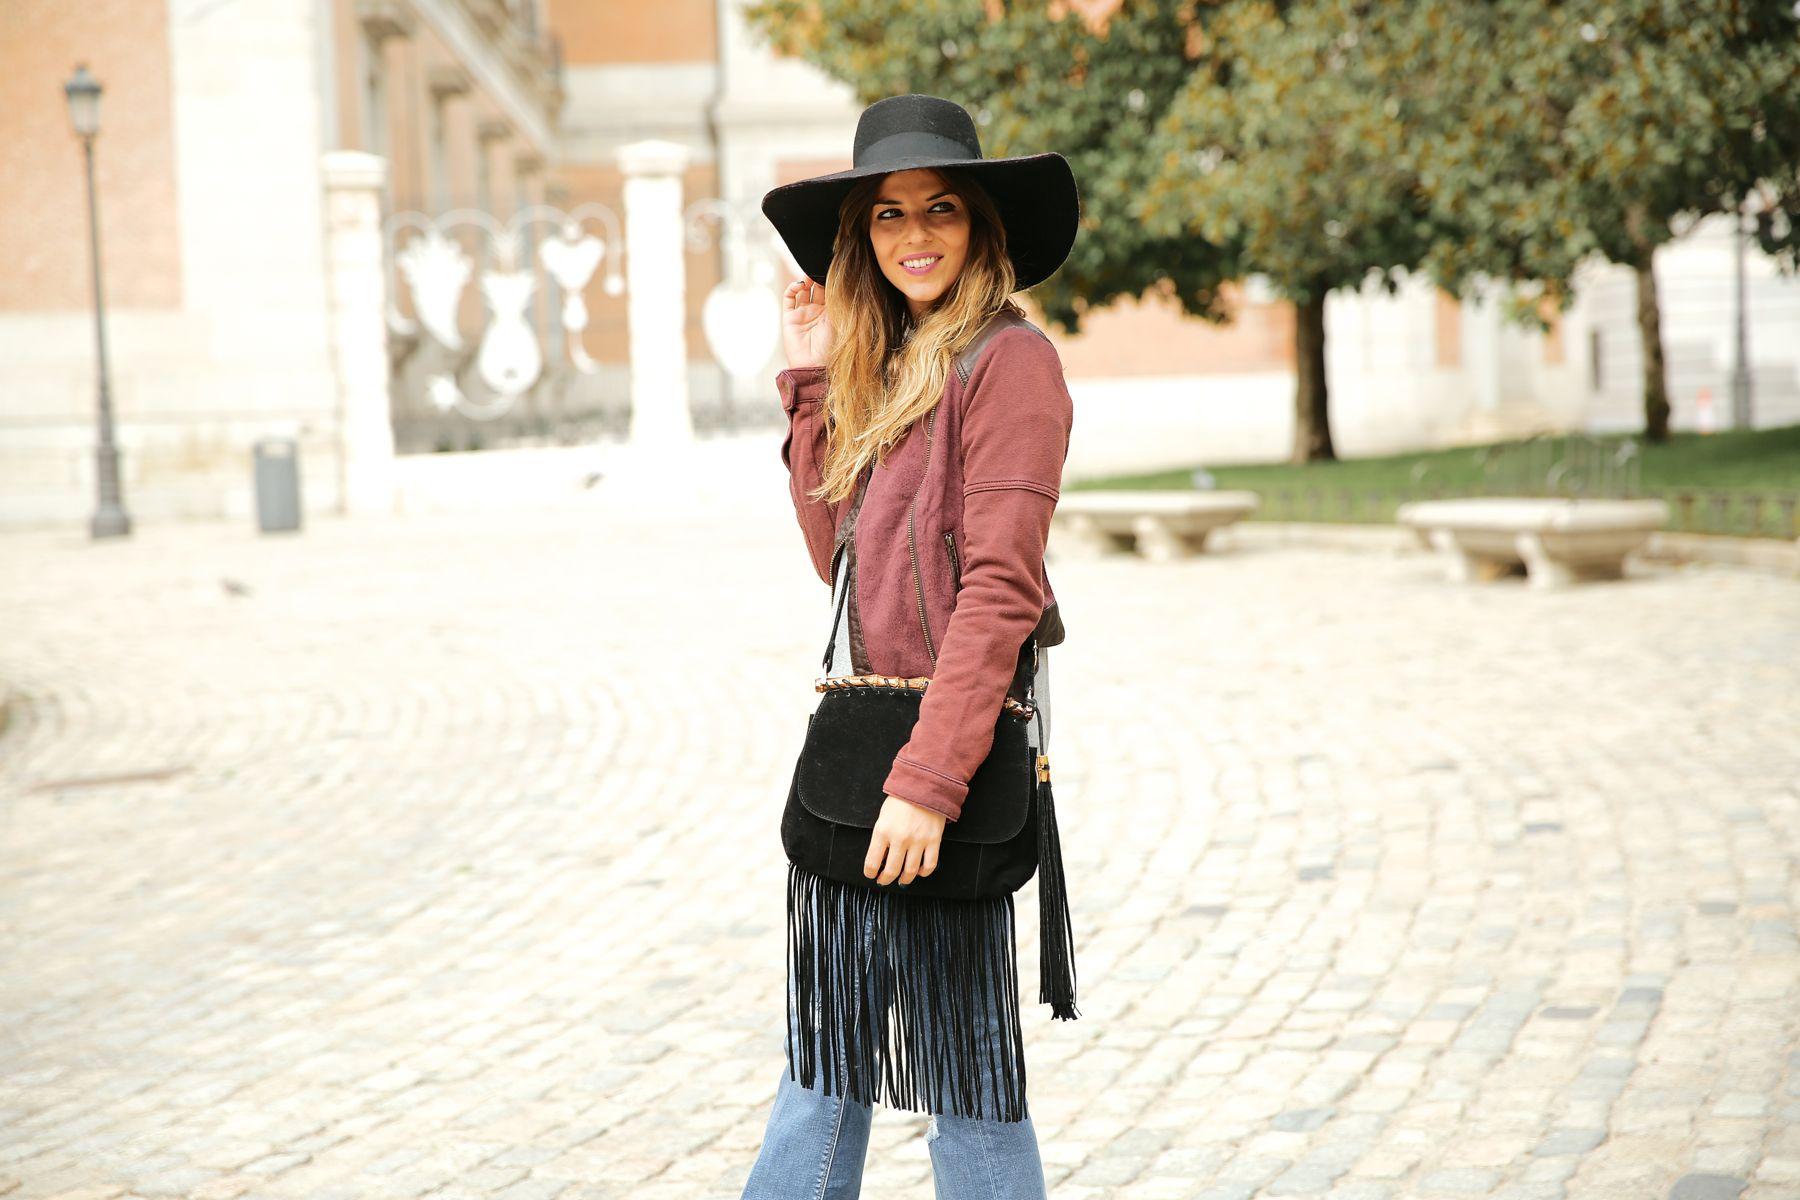 trendy_taste-look-outfit-street_style-ootd-blog-blogger-fashion_spain-moda_españa-AD-adolfo_dominguez-amaia_salamanca-boho-hippie-sombrero-hat-biker-flecos-fringes-5